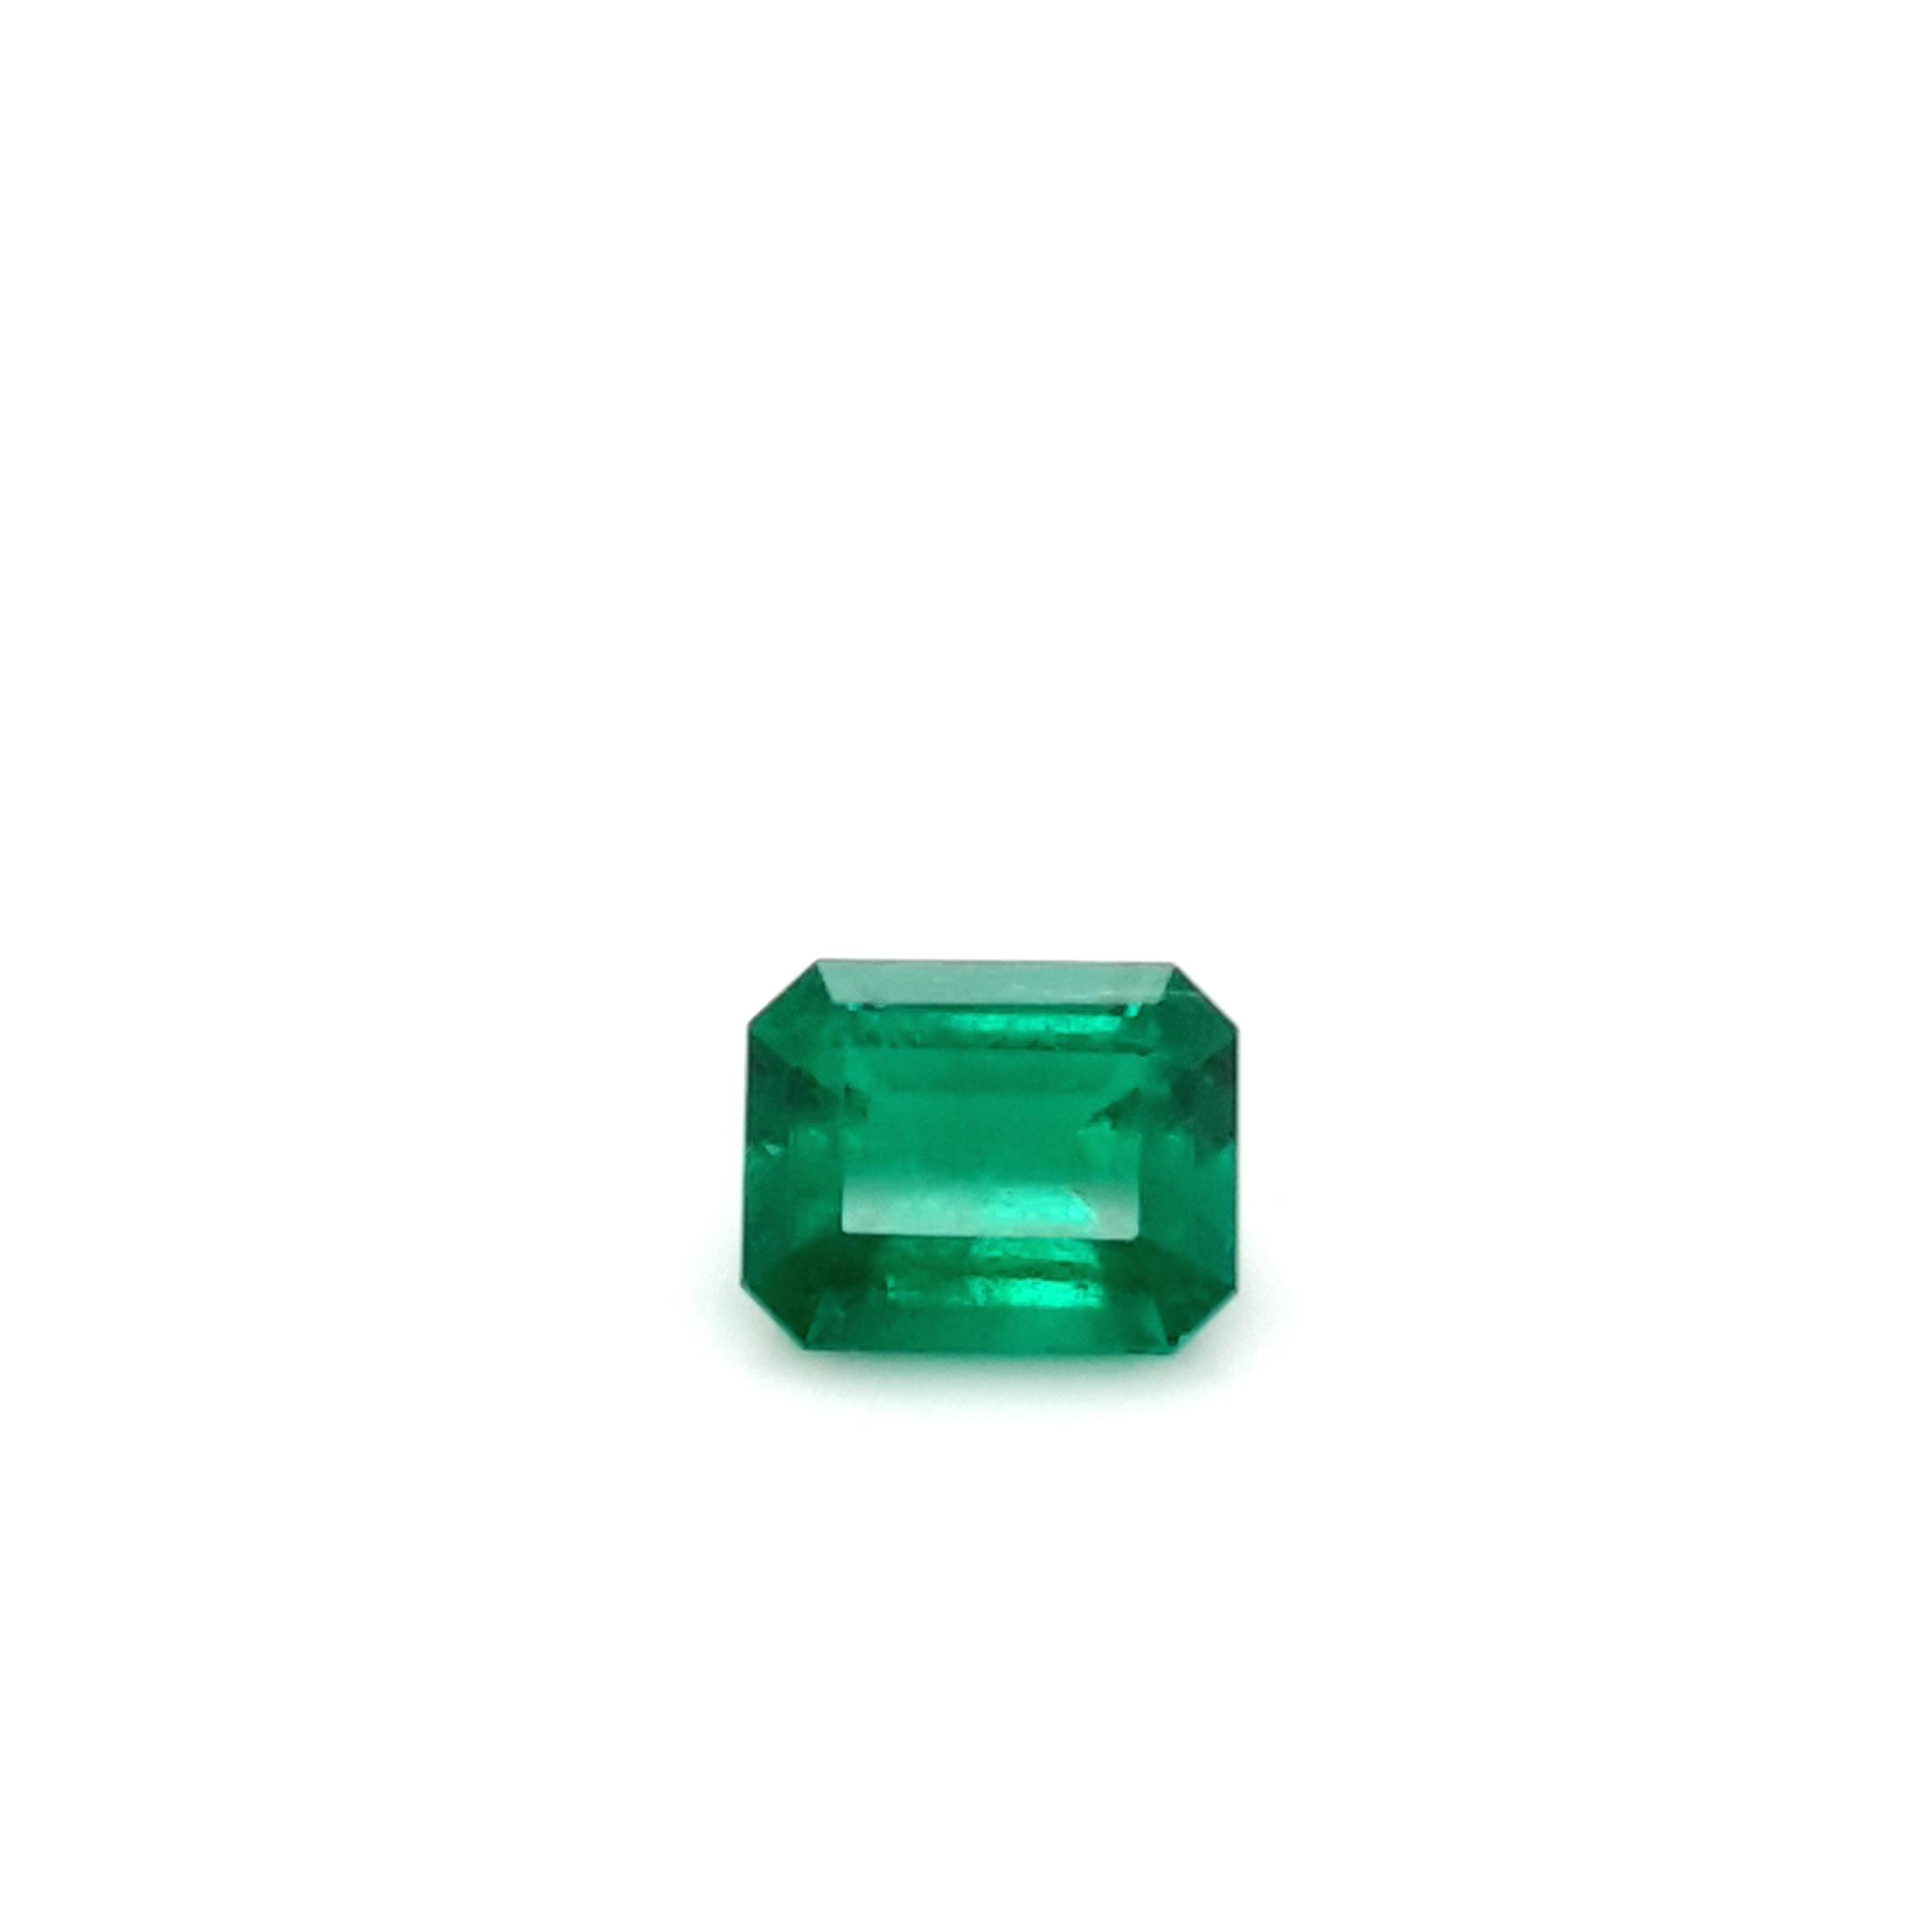 2,06ct Emerald from Colombia MuzoGreen cert. EMI20C23__2021-03-26-11-14-58